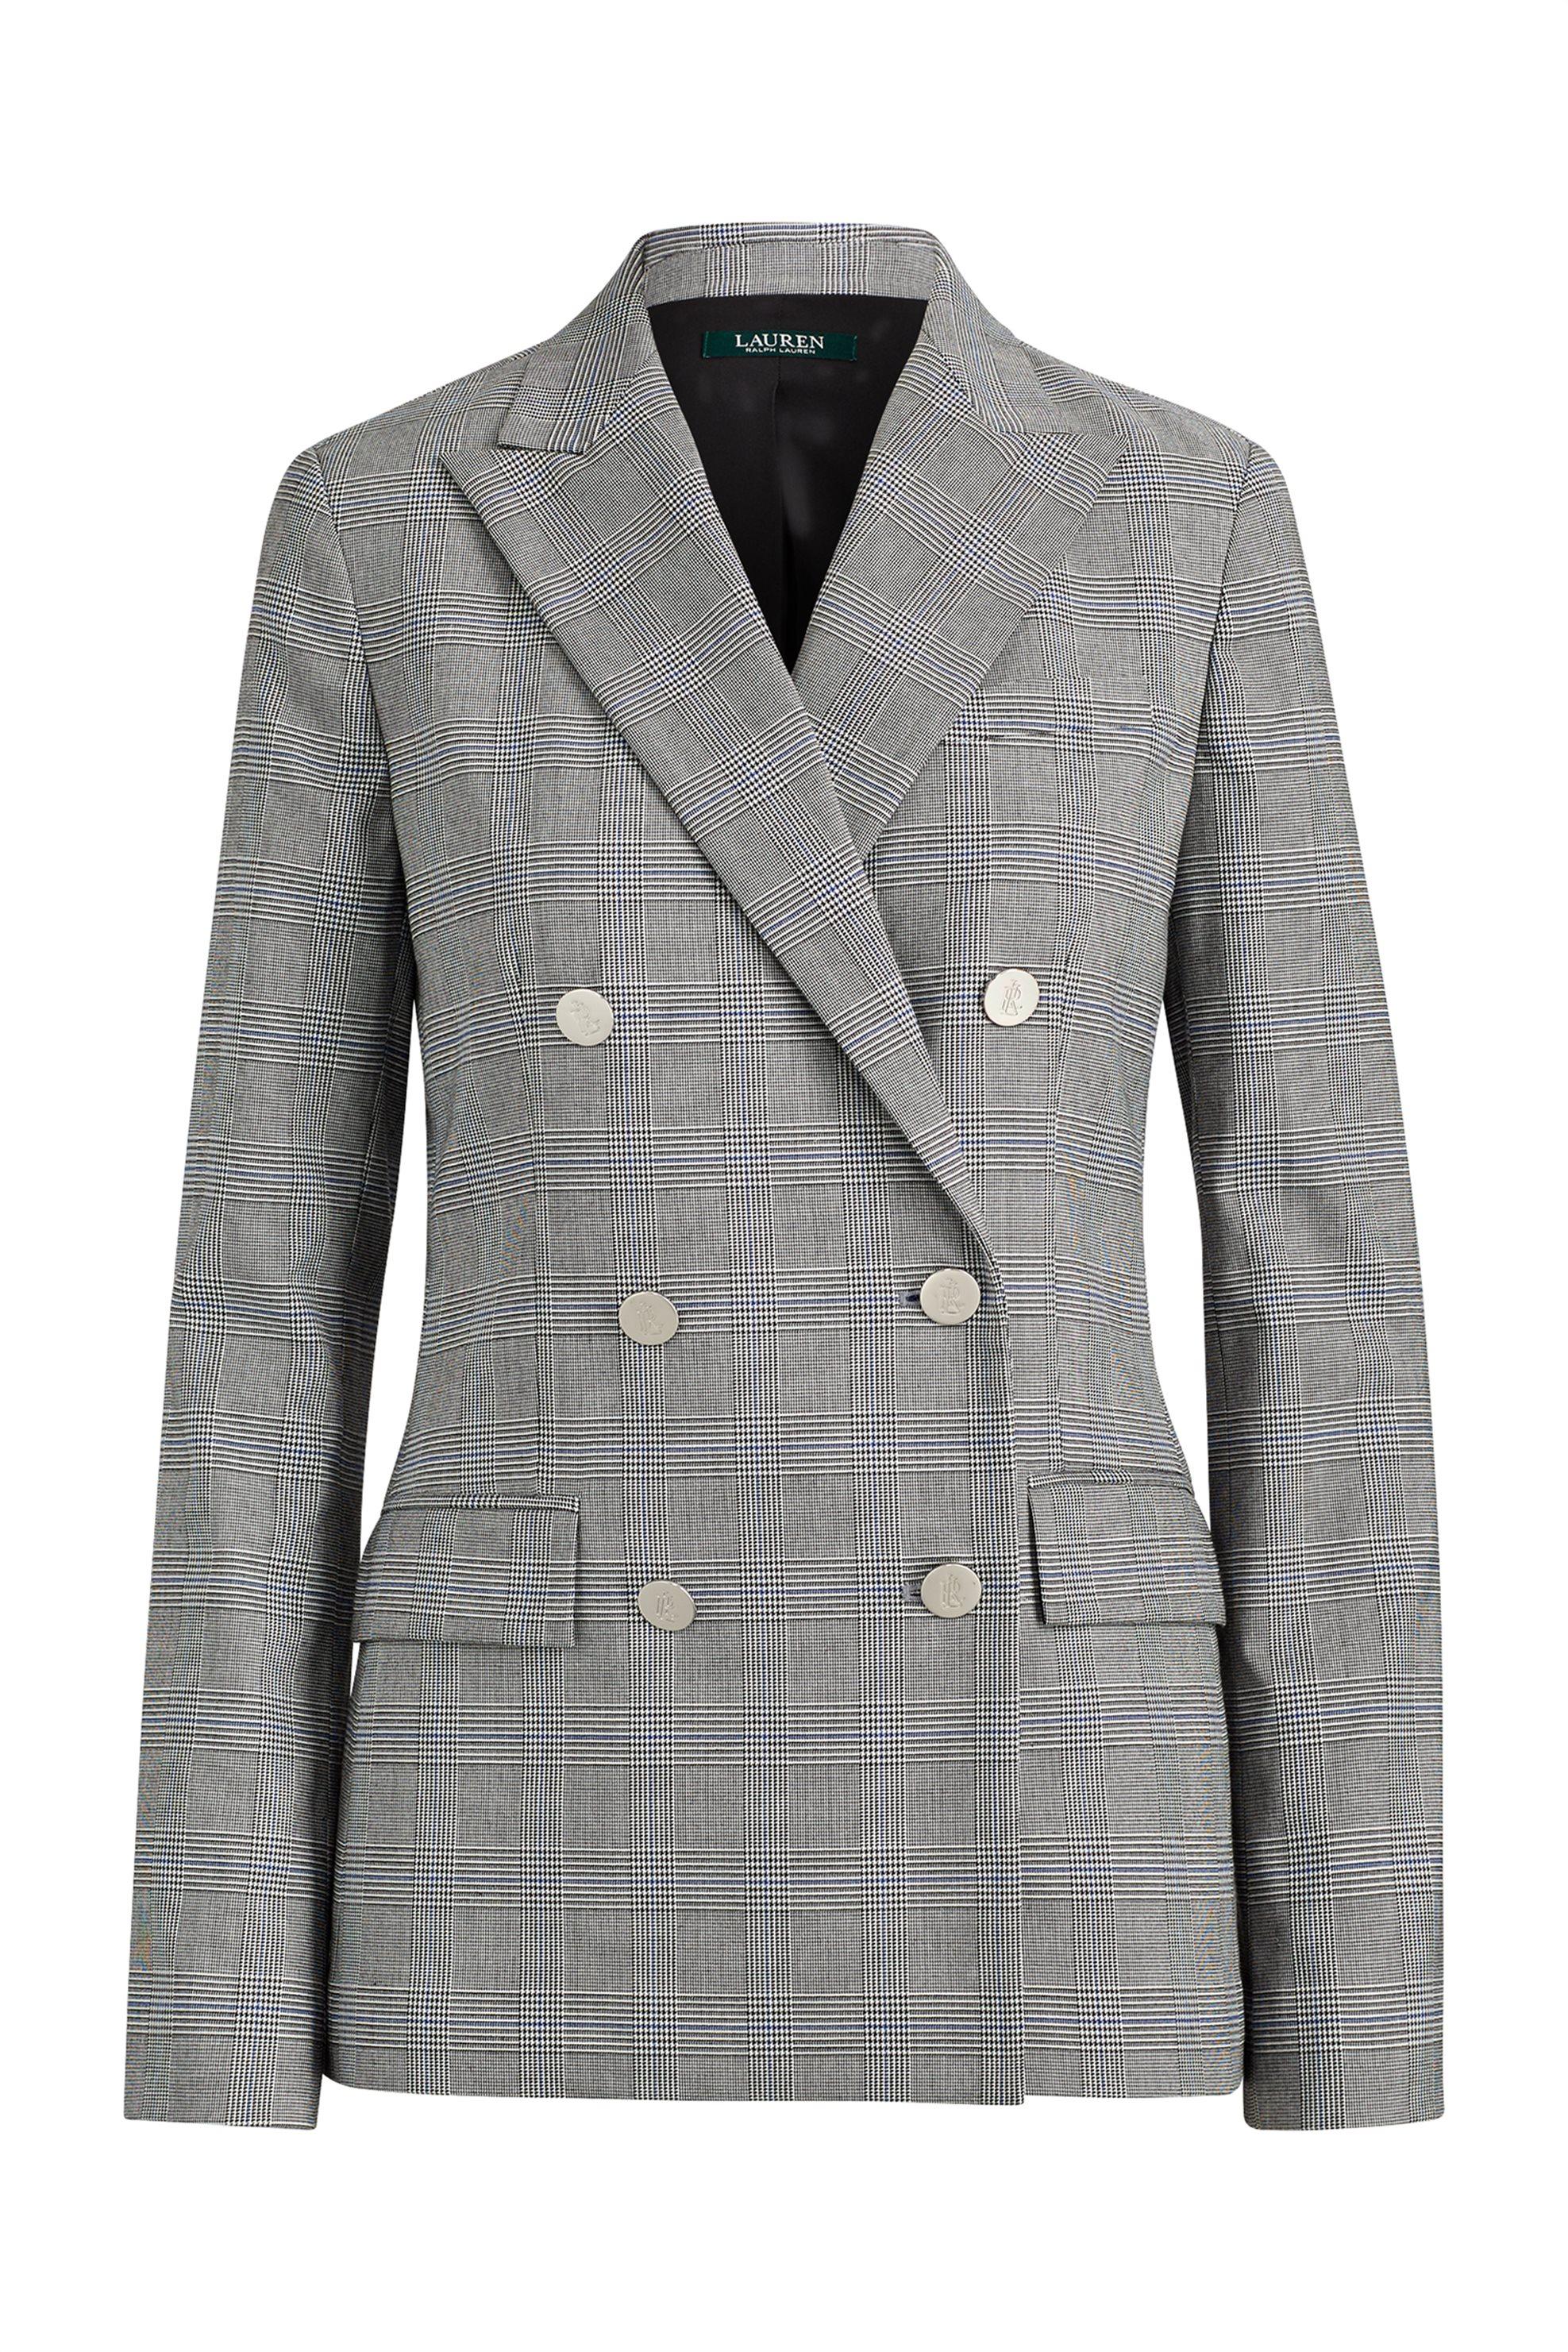 d15650ff7960 Lauren Ralph Lauren γυναικείο καρό σακάκι Double-Breasted - 200726123001 -  Γκρι